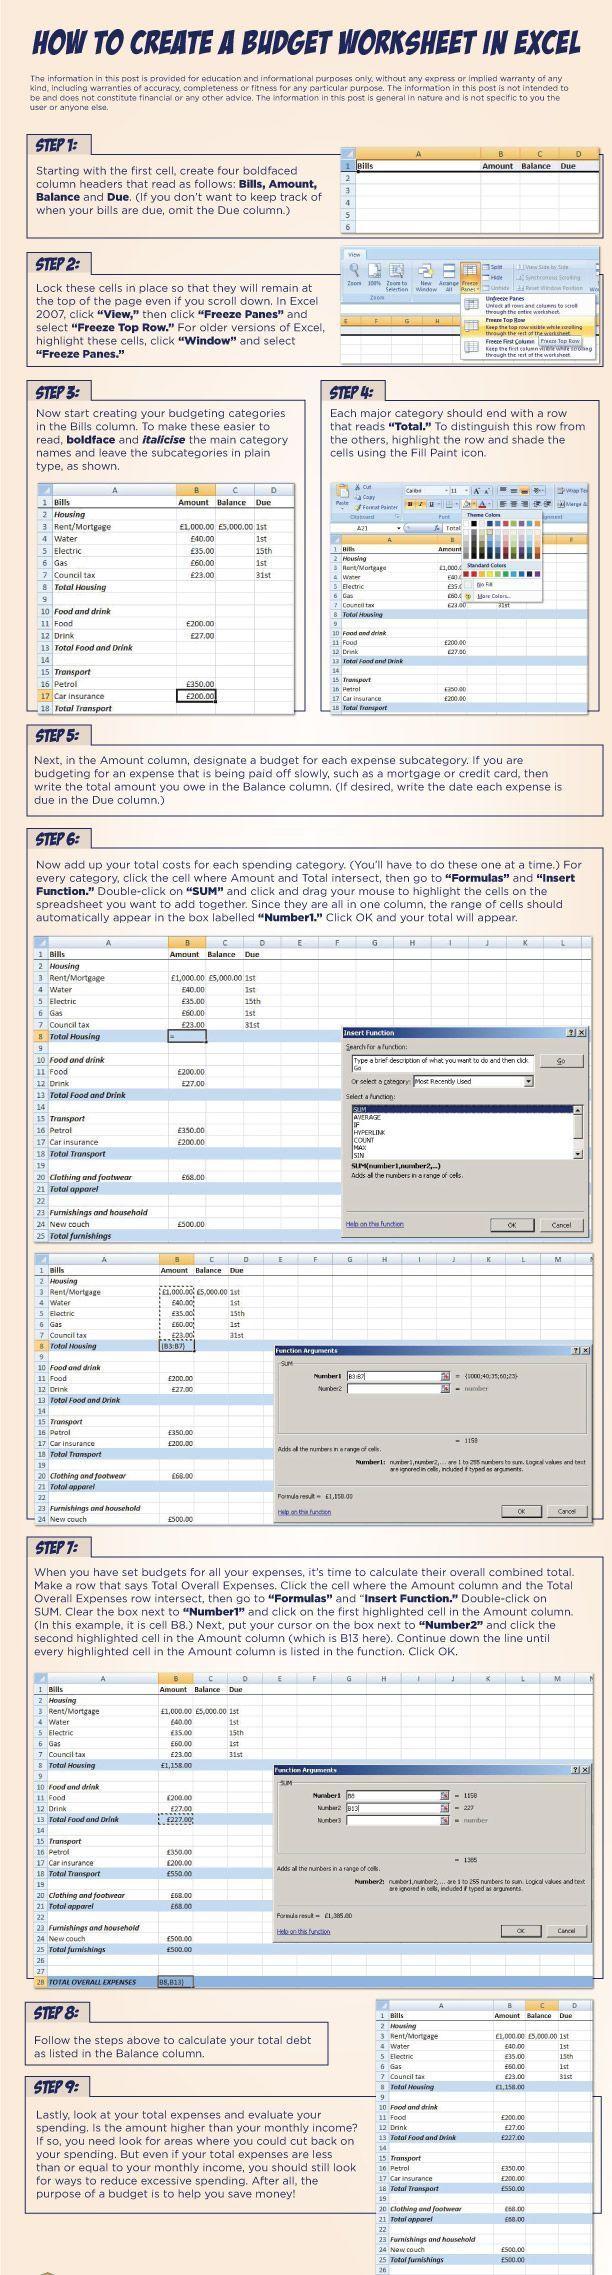 Worksheets Kiplinger Budget Worksheet learn how to create a budget worksheet in excel step by step